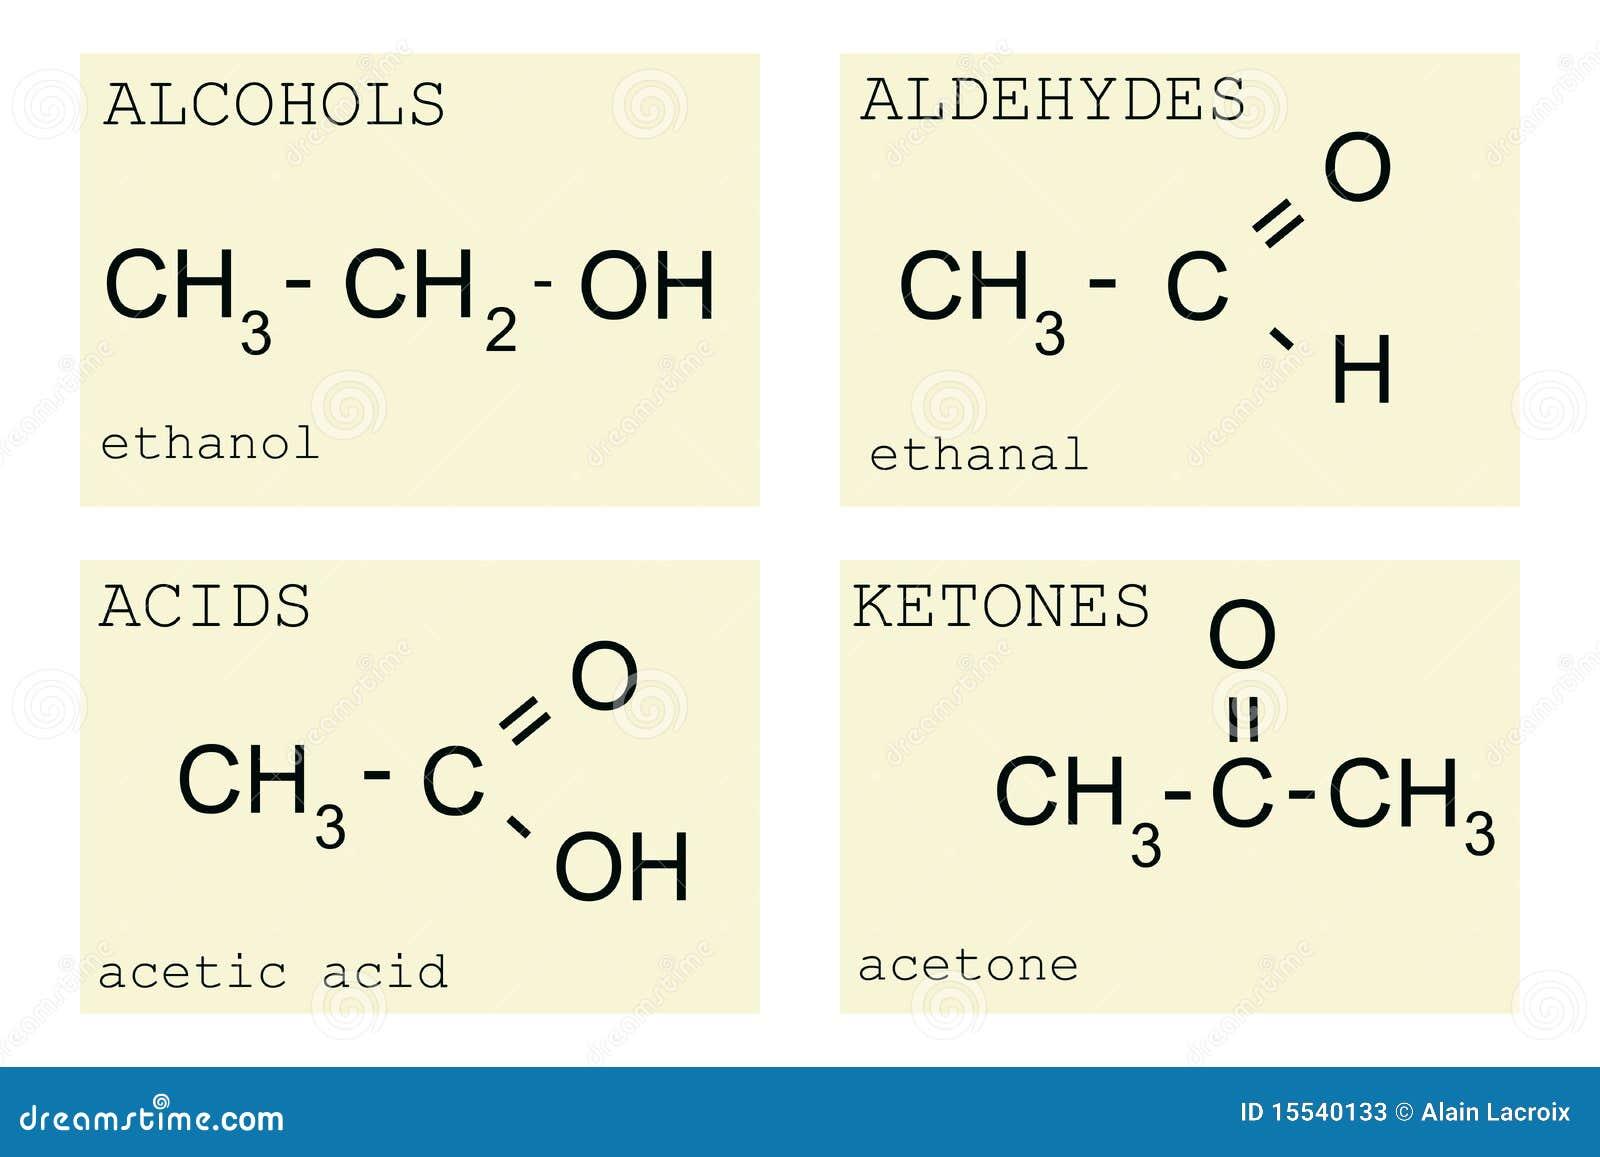 4 Ways to Learn Chemistry - wikiHow